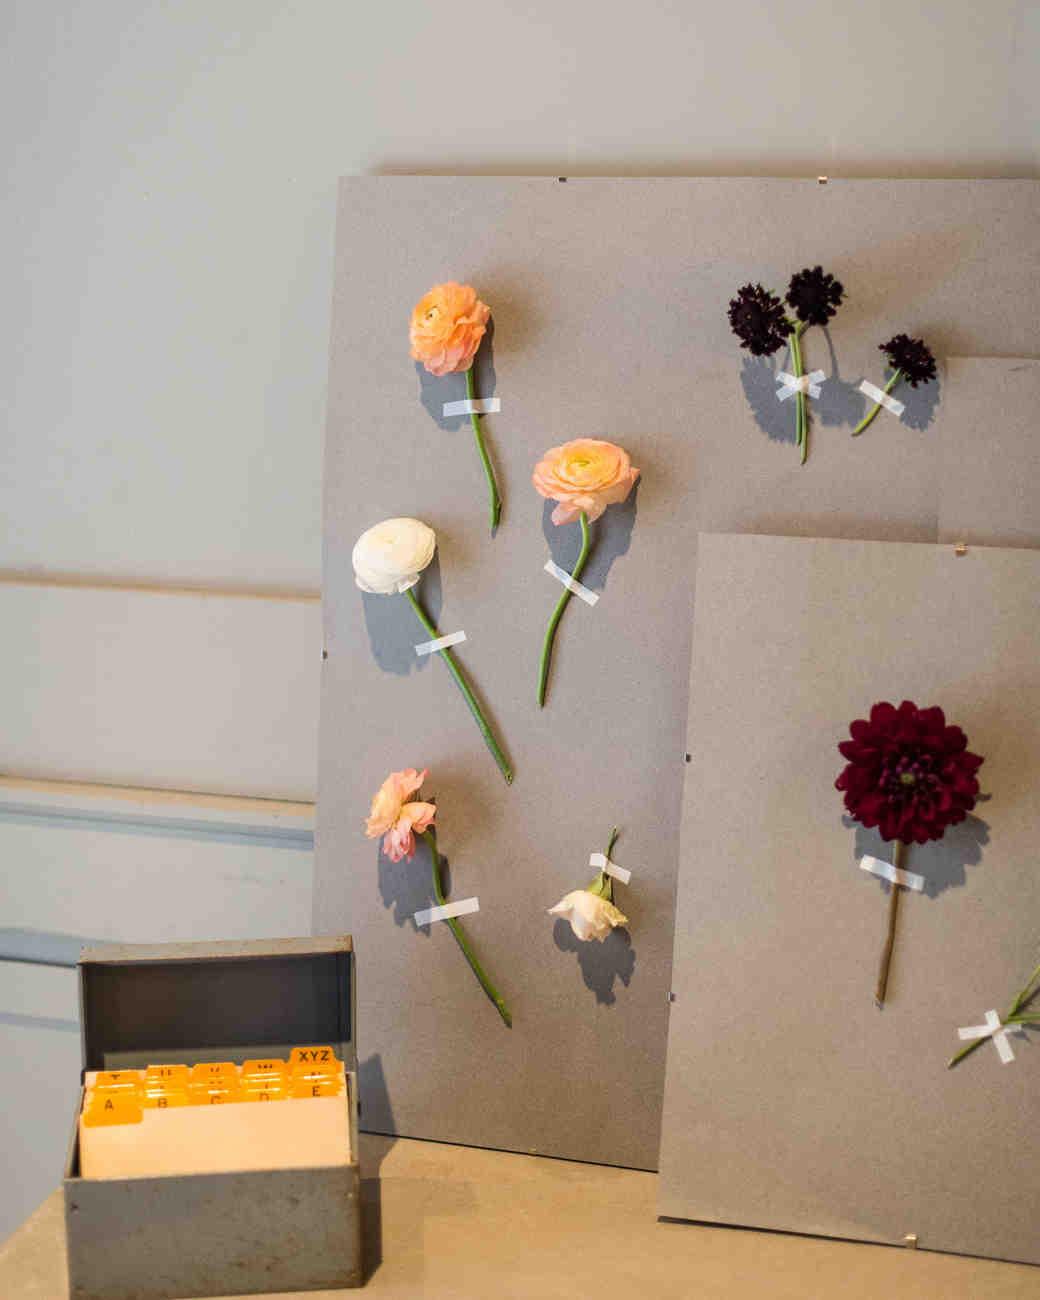 caitlin-michael-wedding-escortcards-683-s111835-0415.jpg